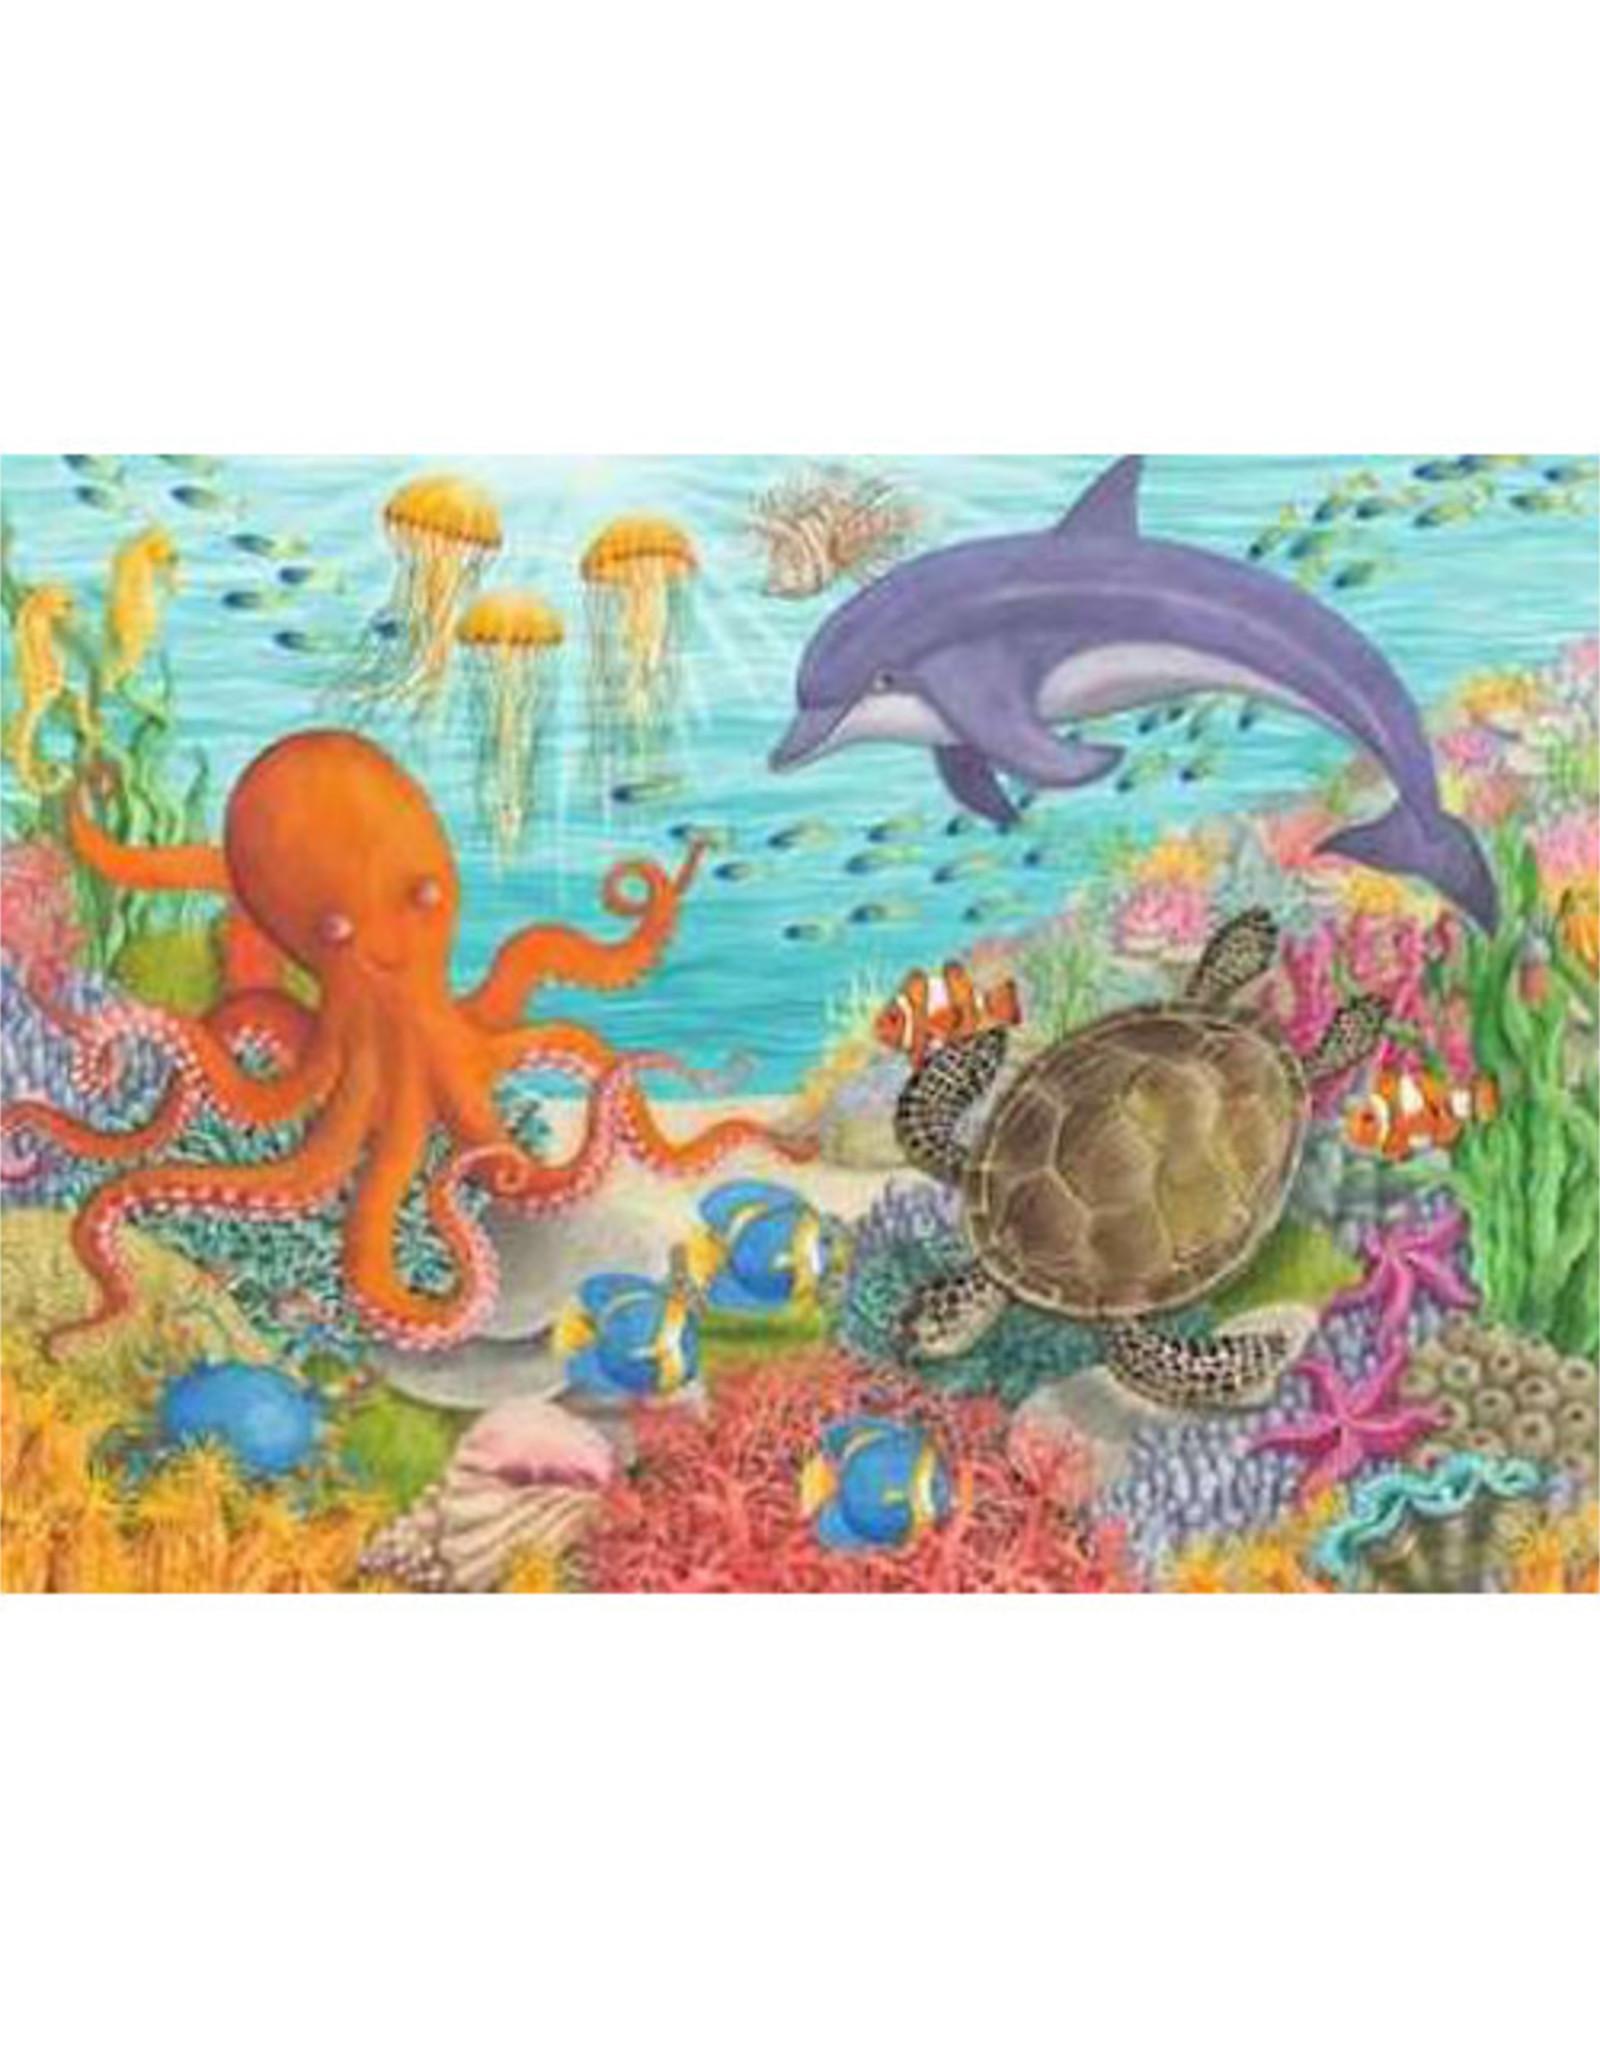 Ravensburger Ocean Friends-35pc